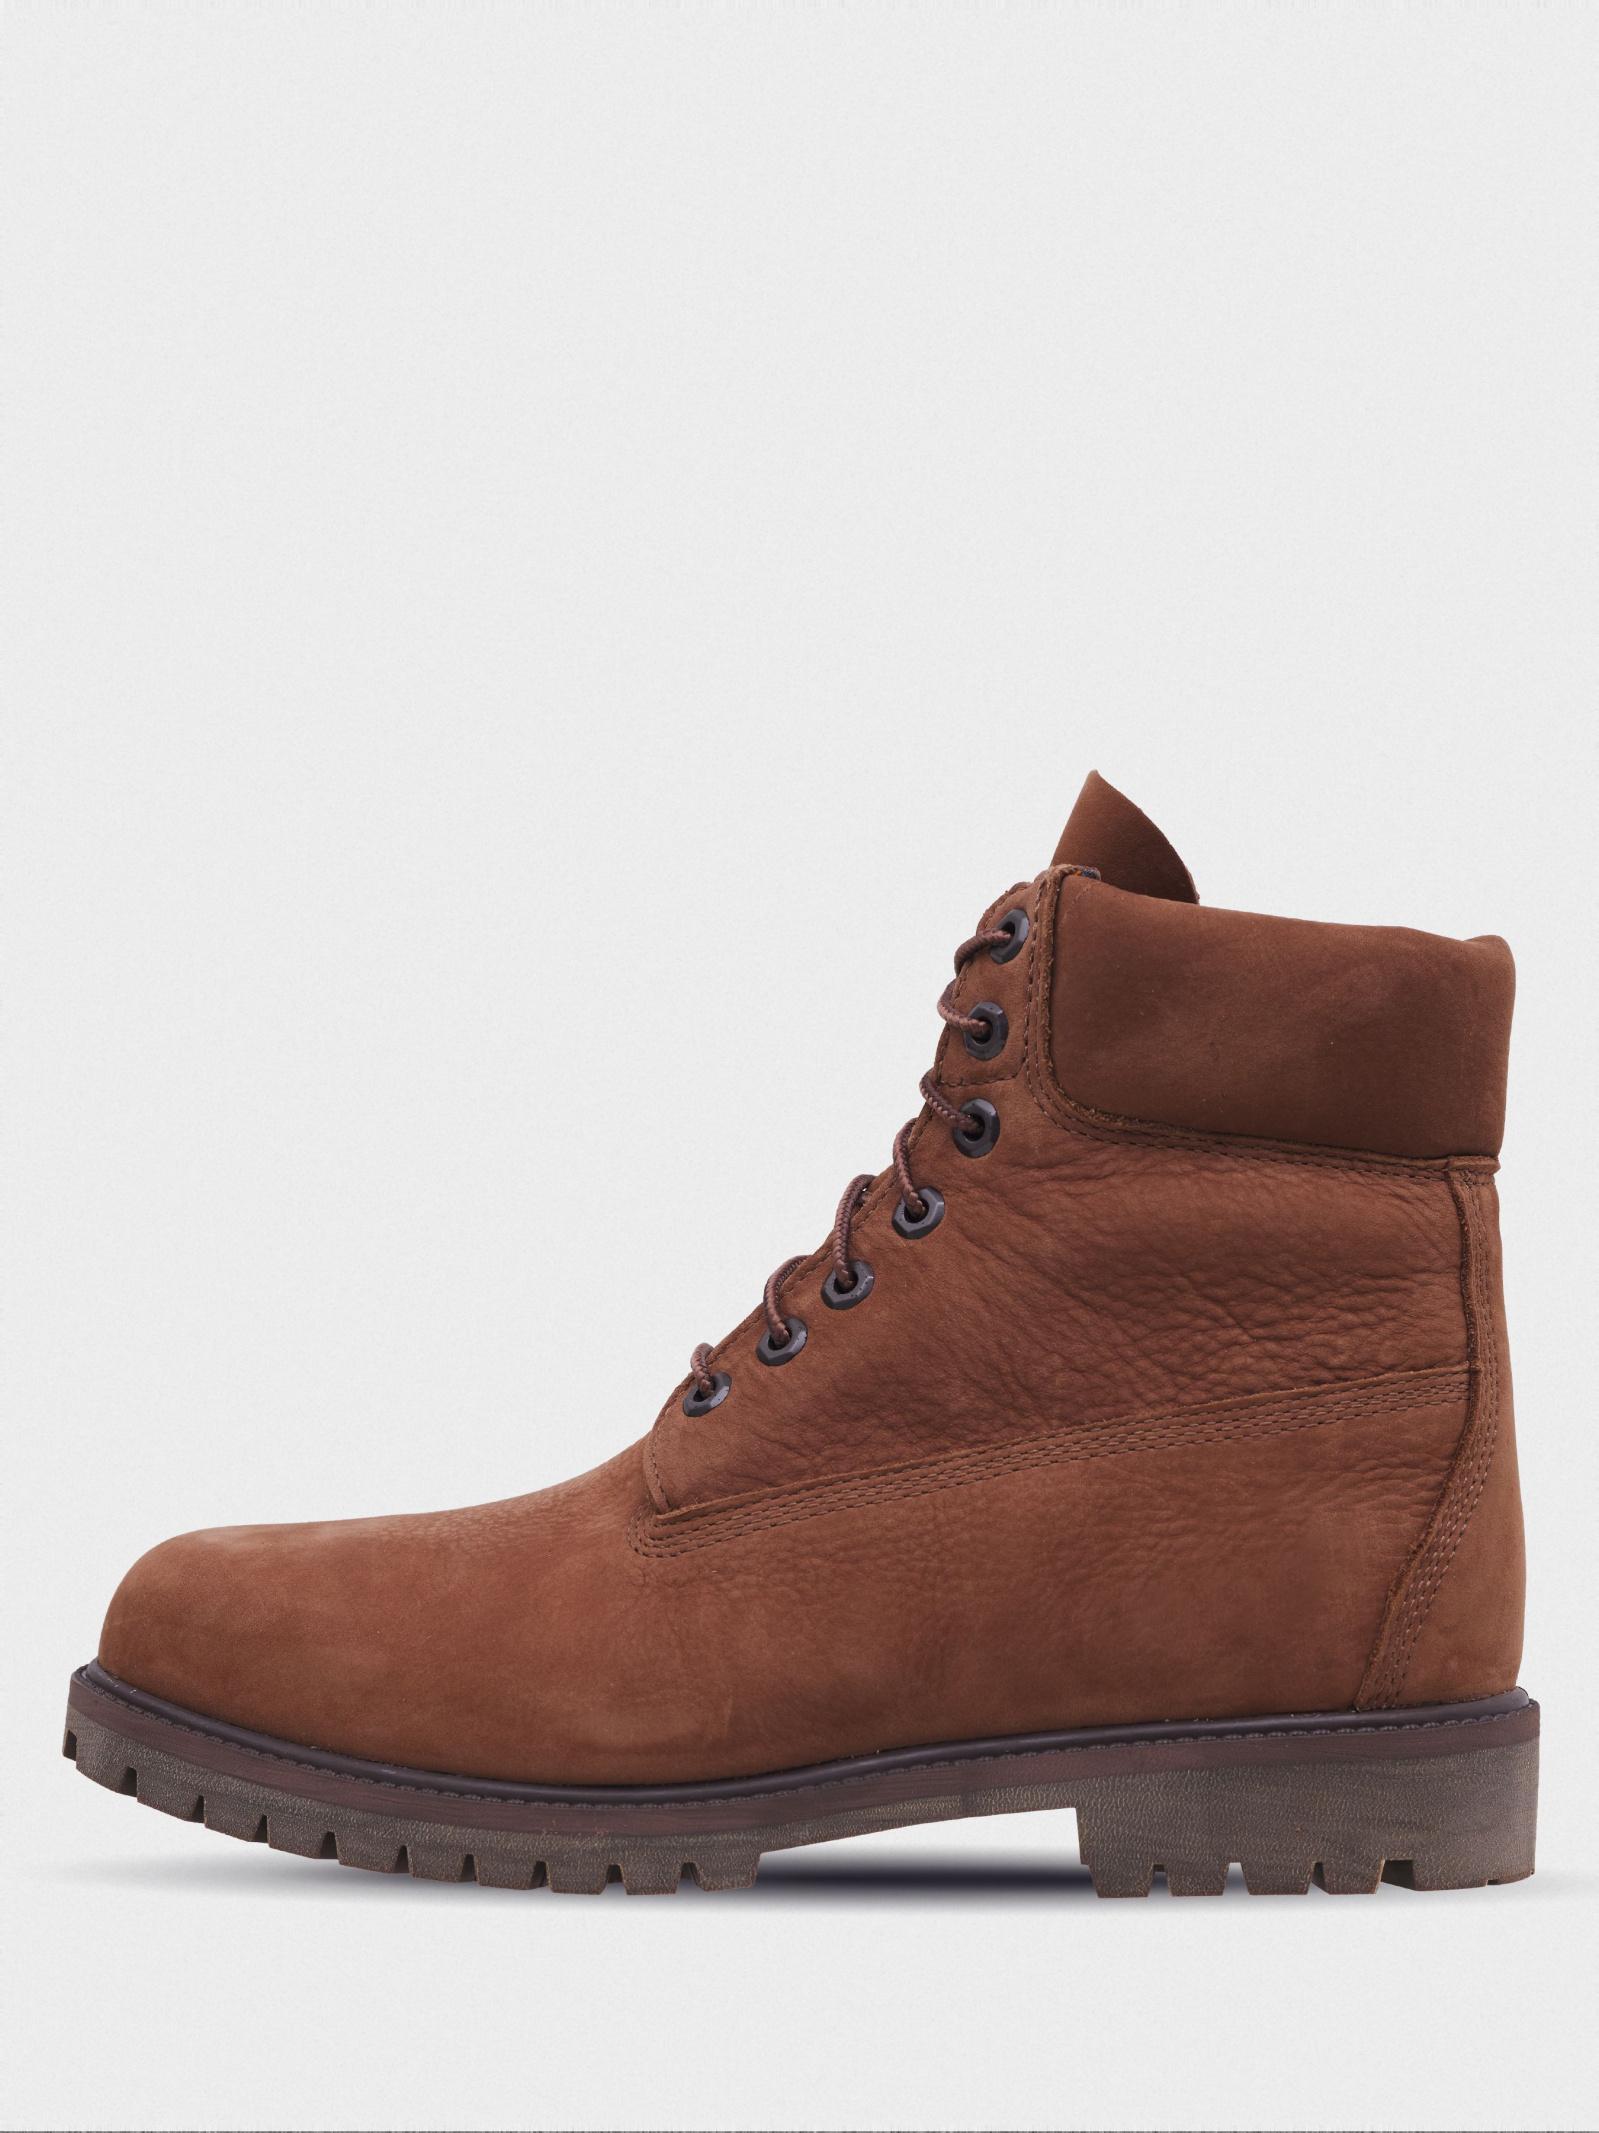 Ботинки для мужчин Timberland Timberland Heritage TF4053 смотреть, 2017